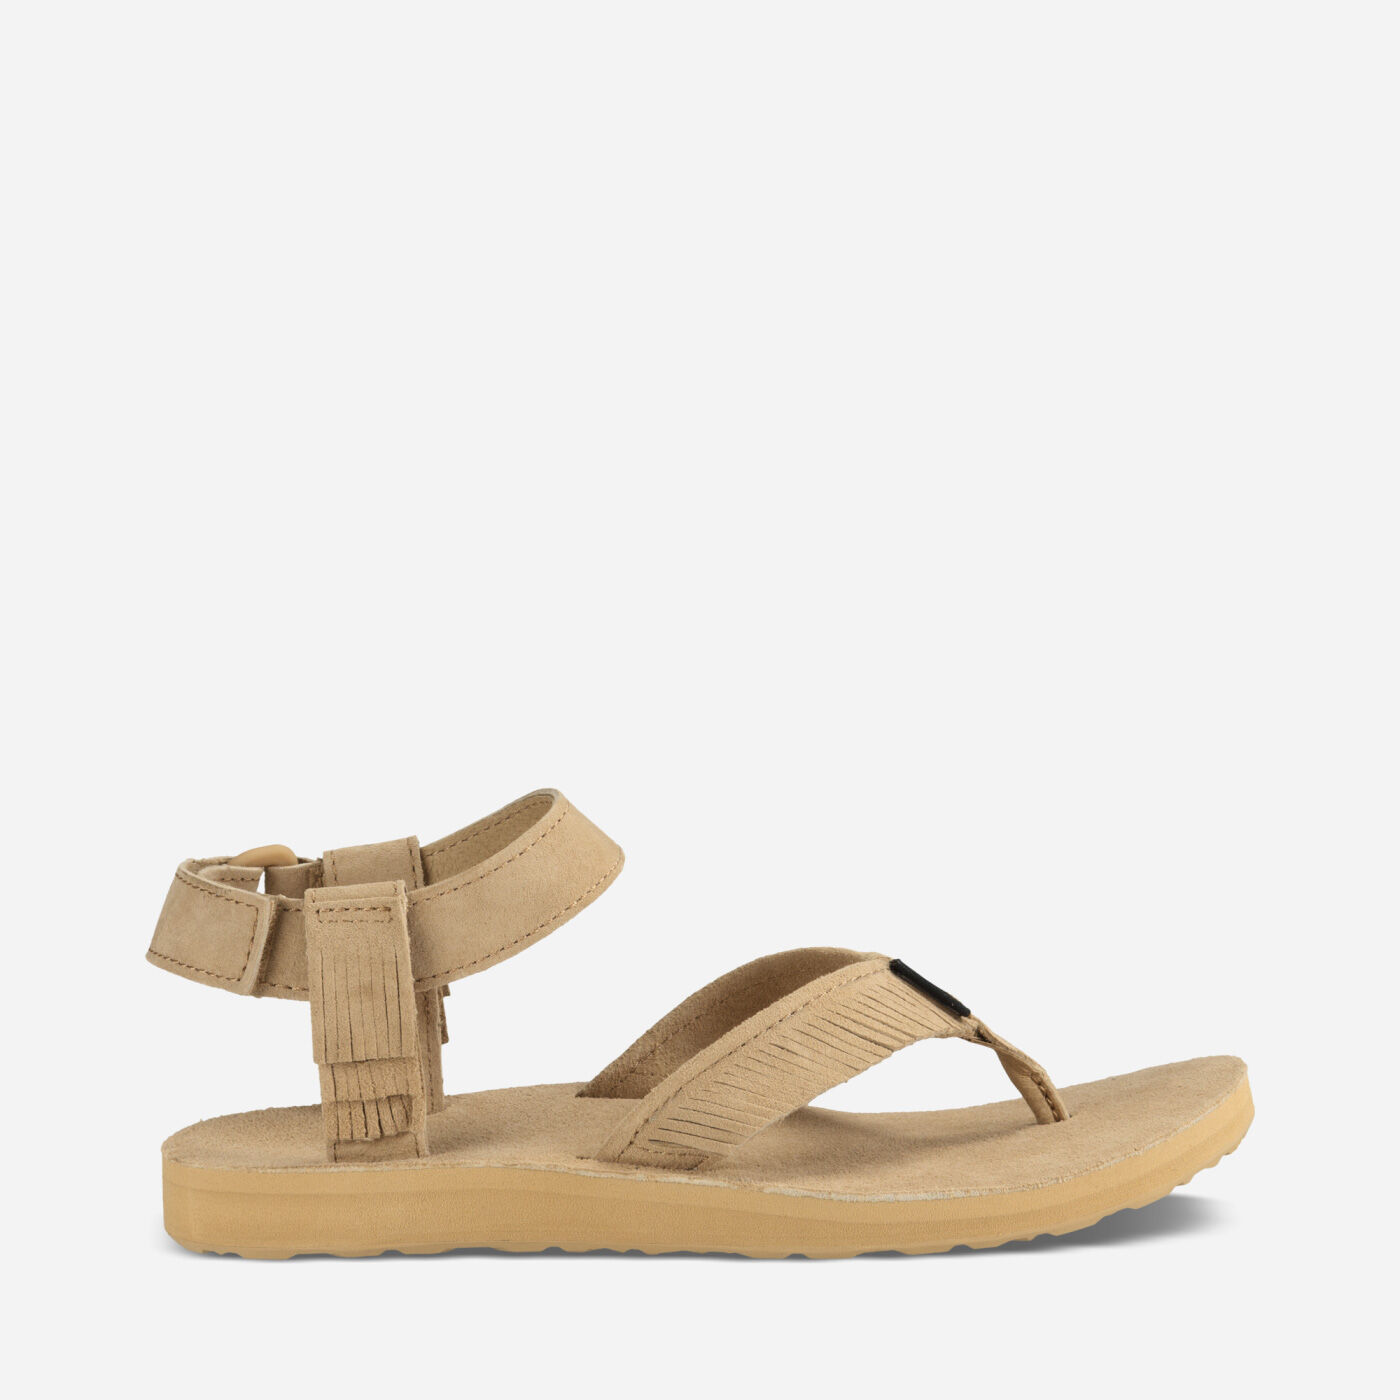 Women's zirra sandals - Original Sandal Leather Fringe